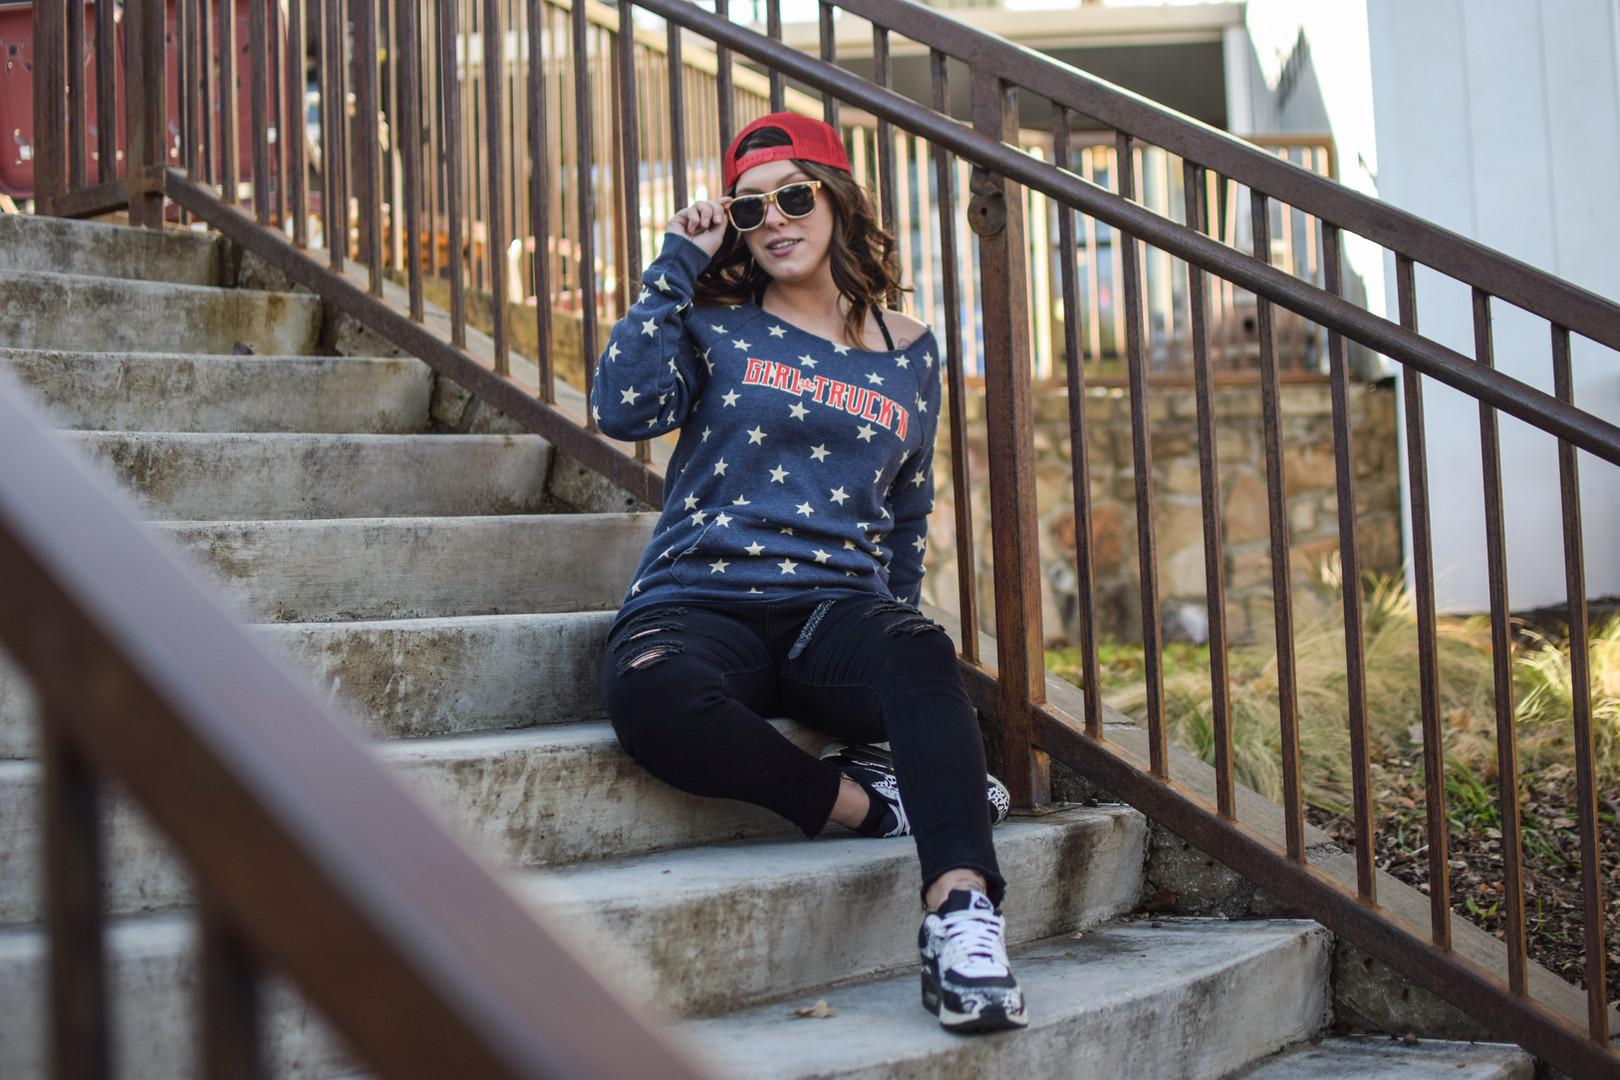 Stars sweater